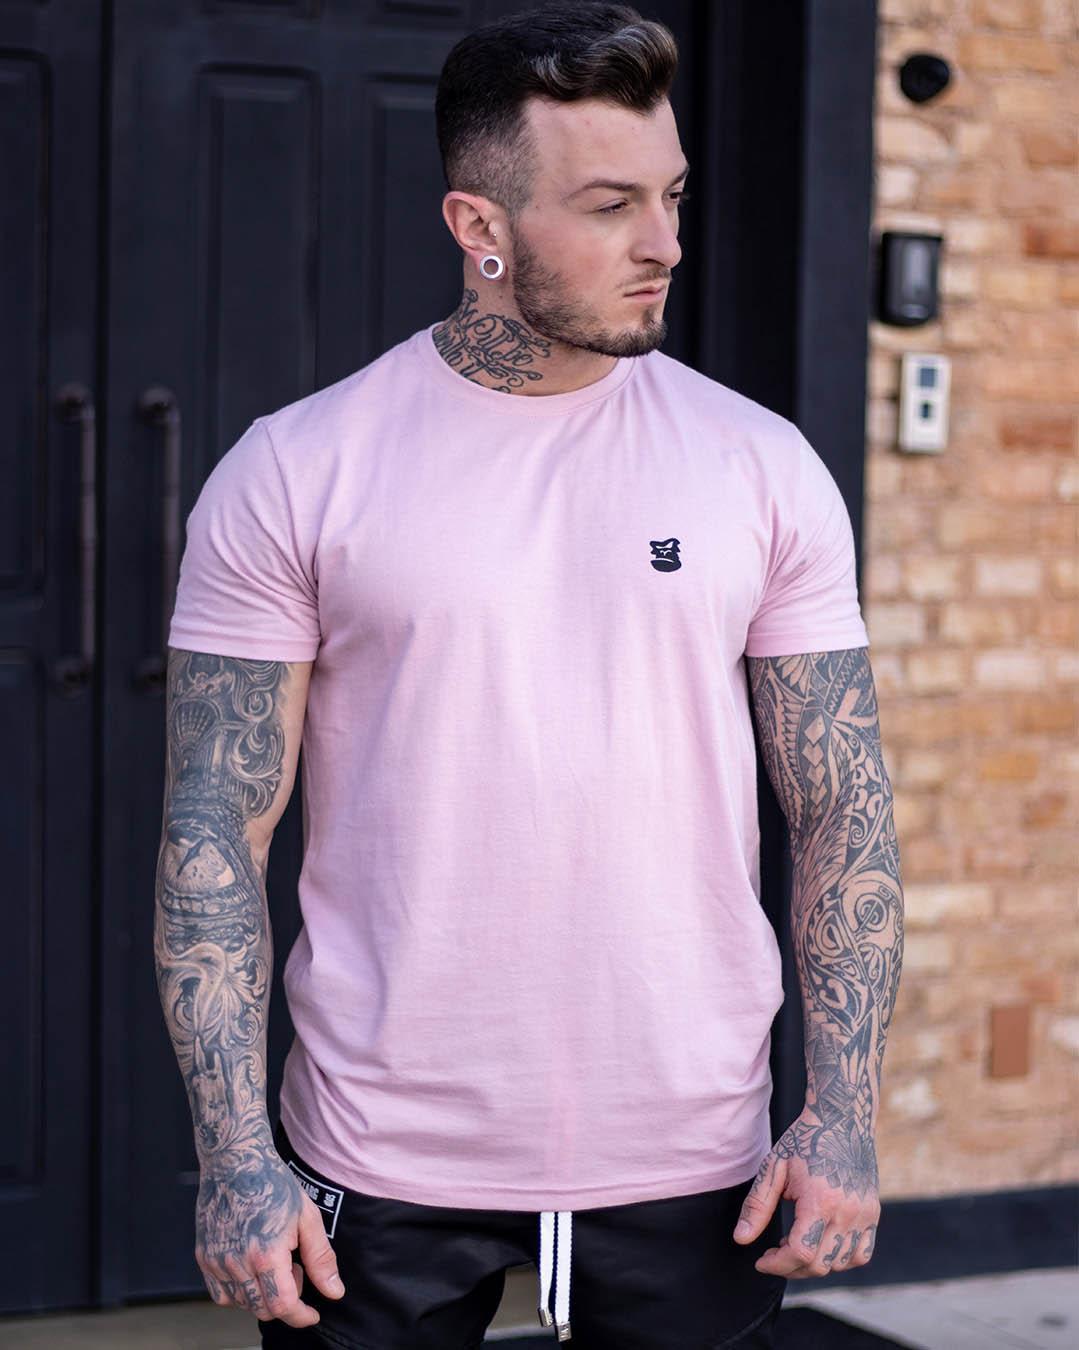 Camiseta Rosa Morrissey Masculina